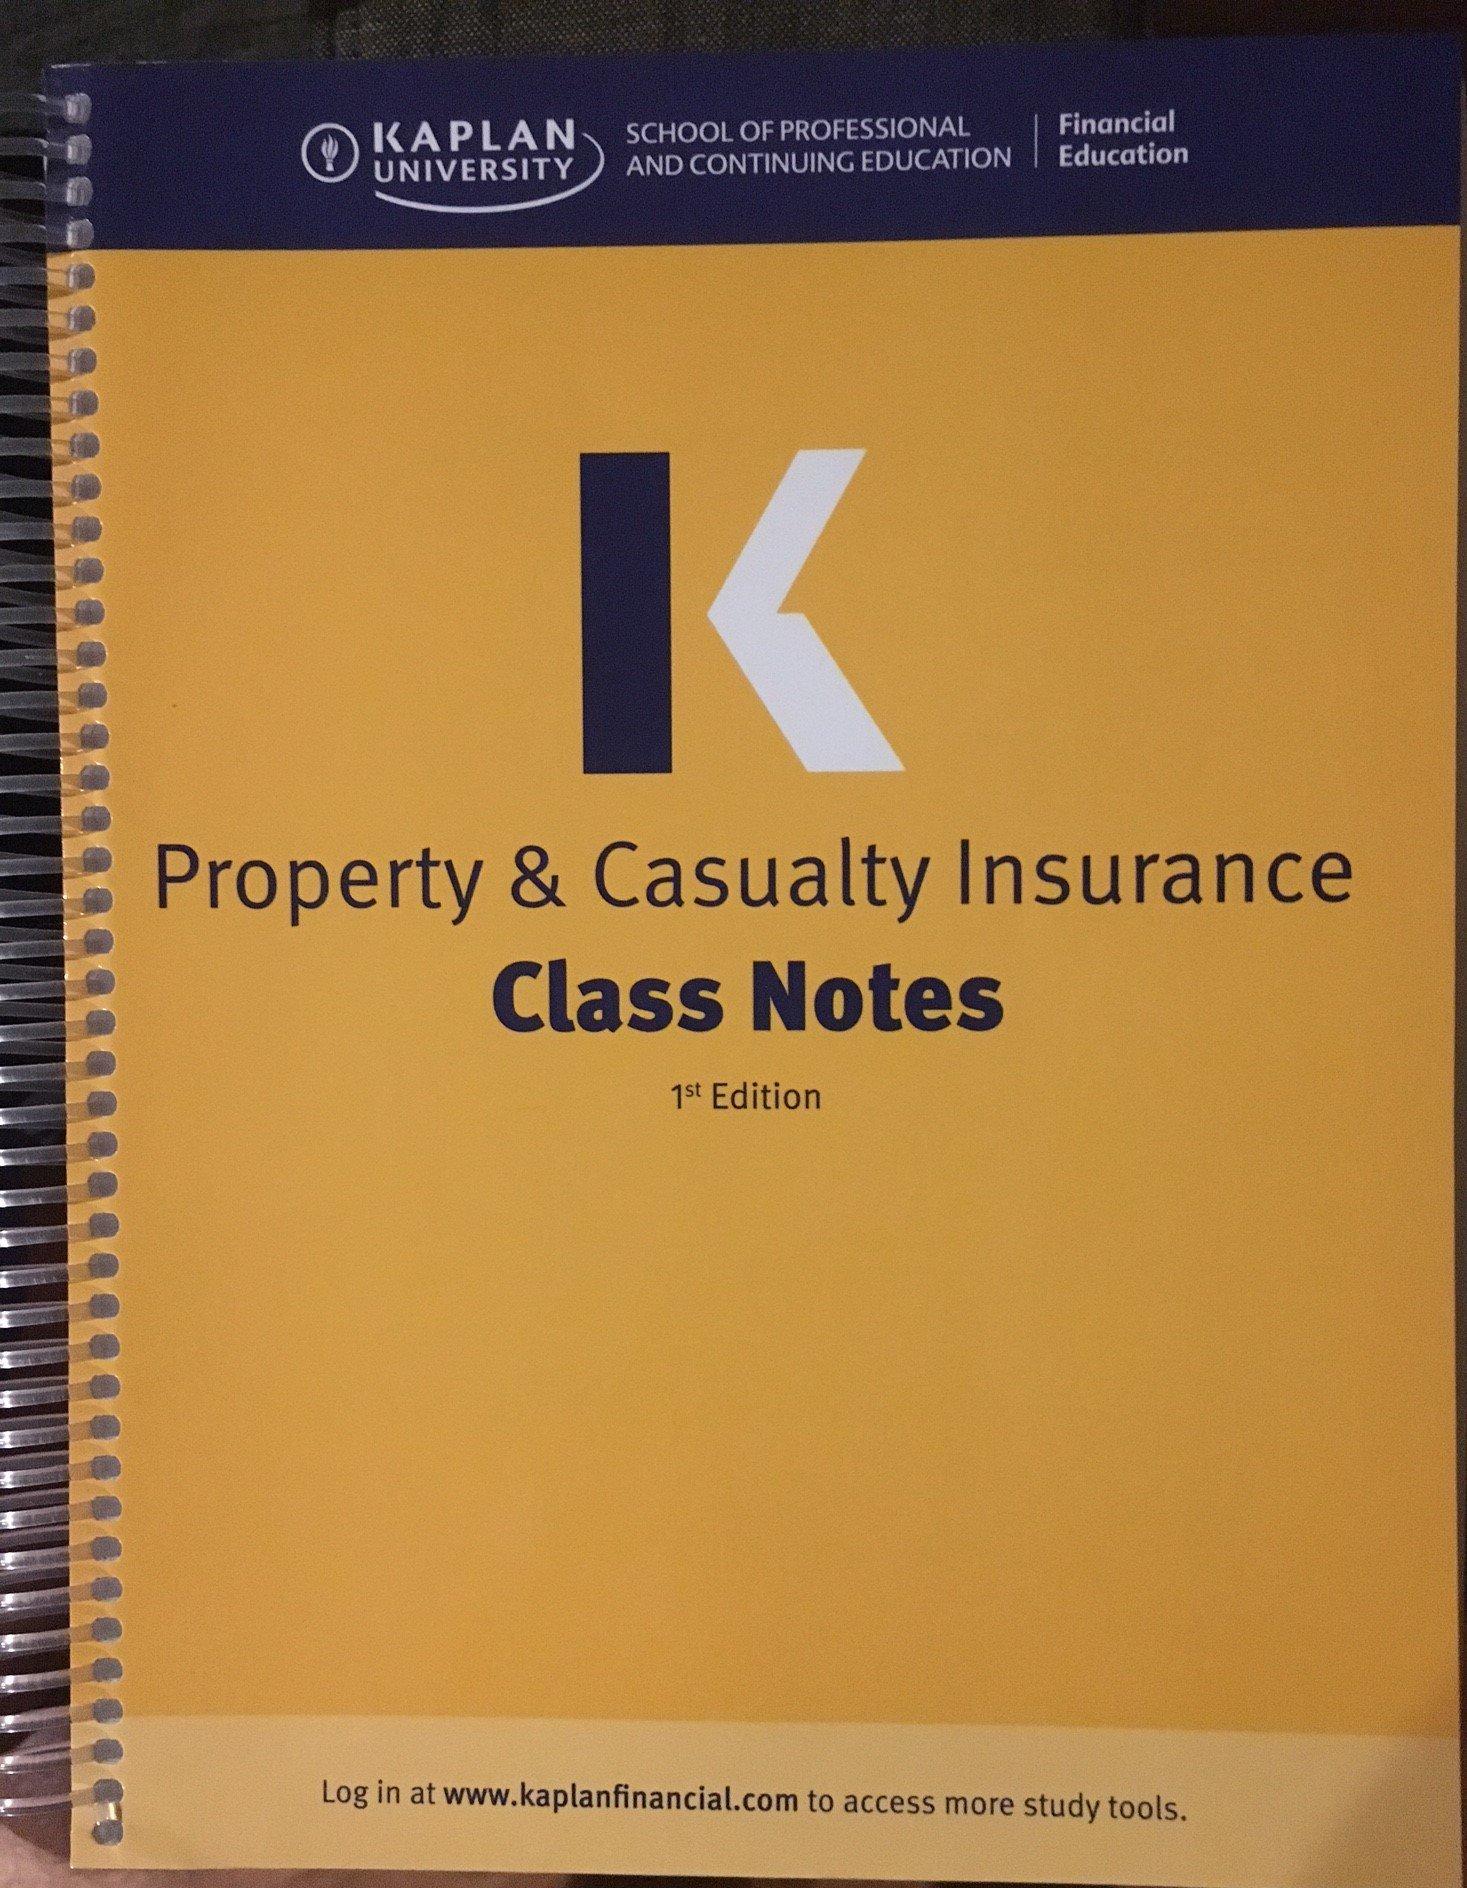 Propertycasualty insurance li kaplan financial education propertycasualty insurance li kaplan financial education 9781427725066 amazon books fandeluxe Gallery